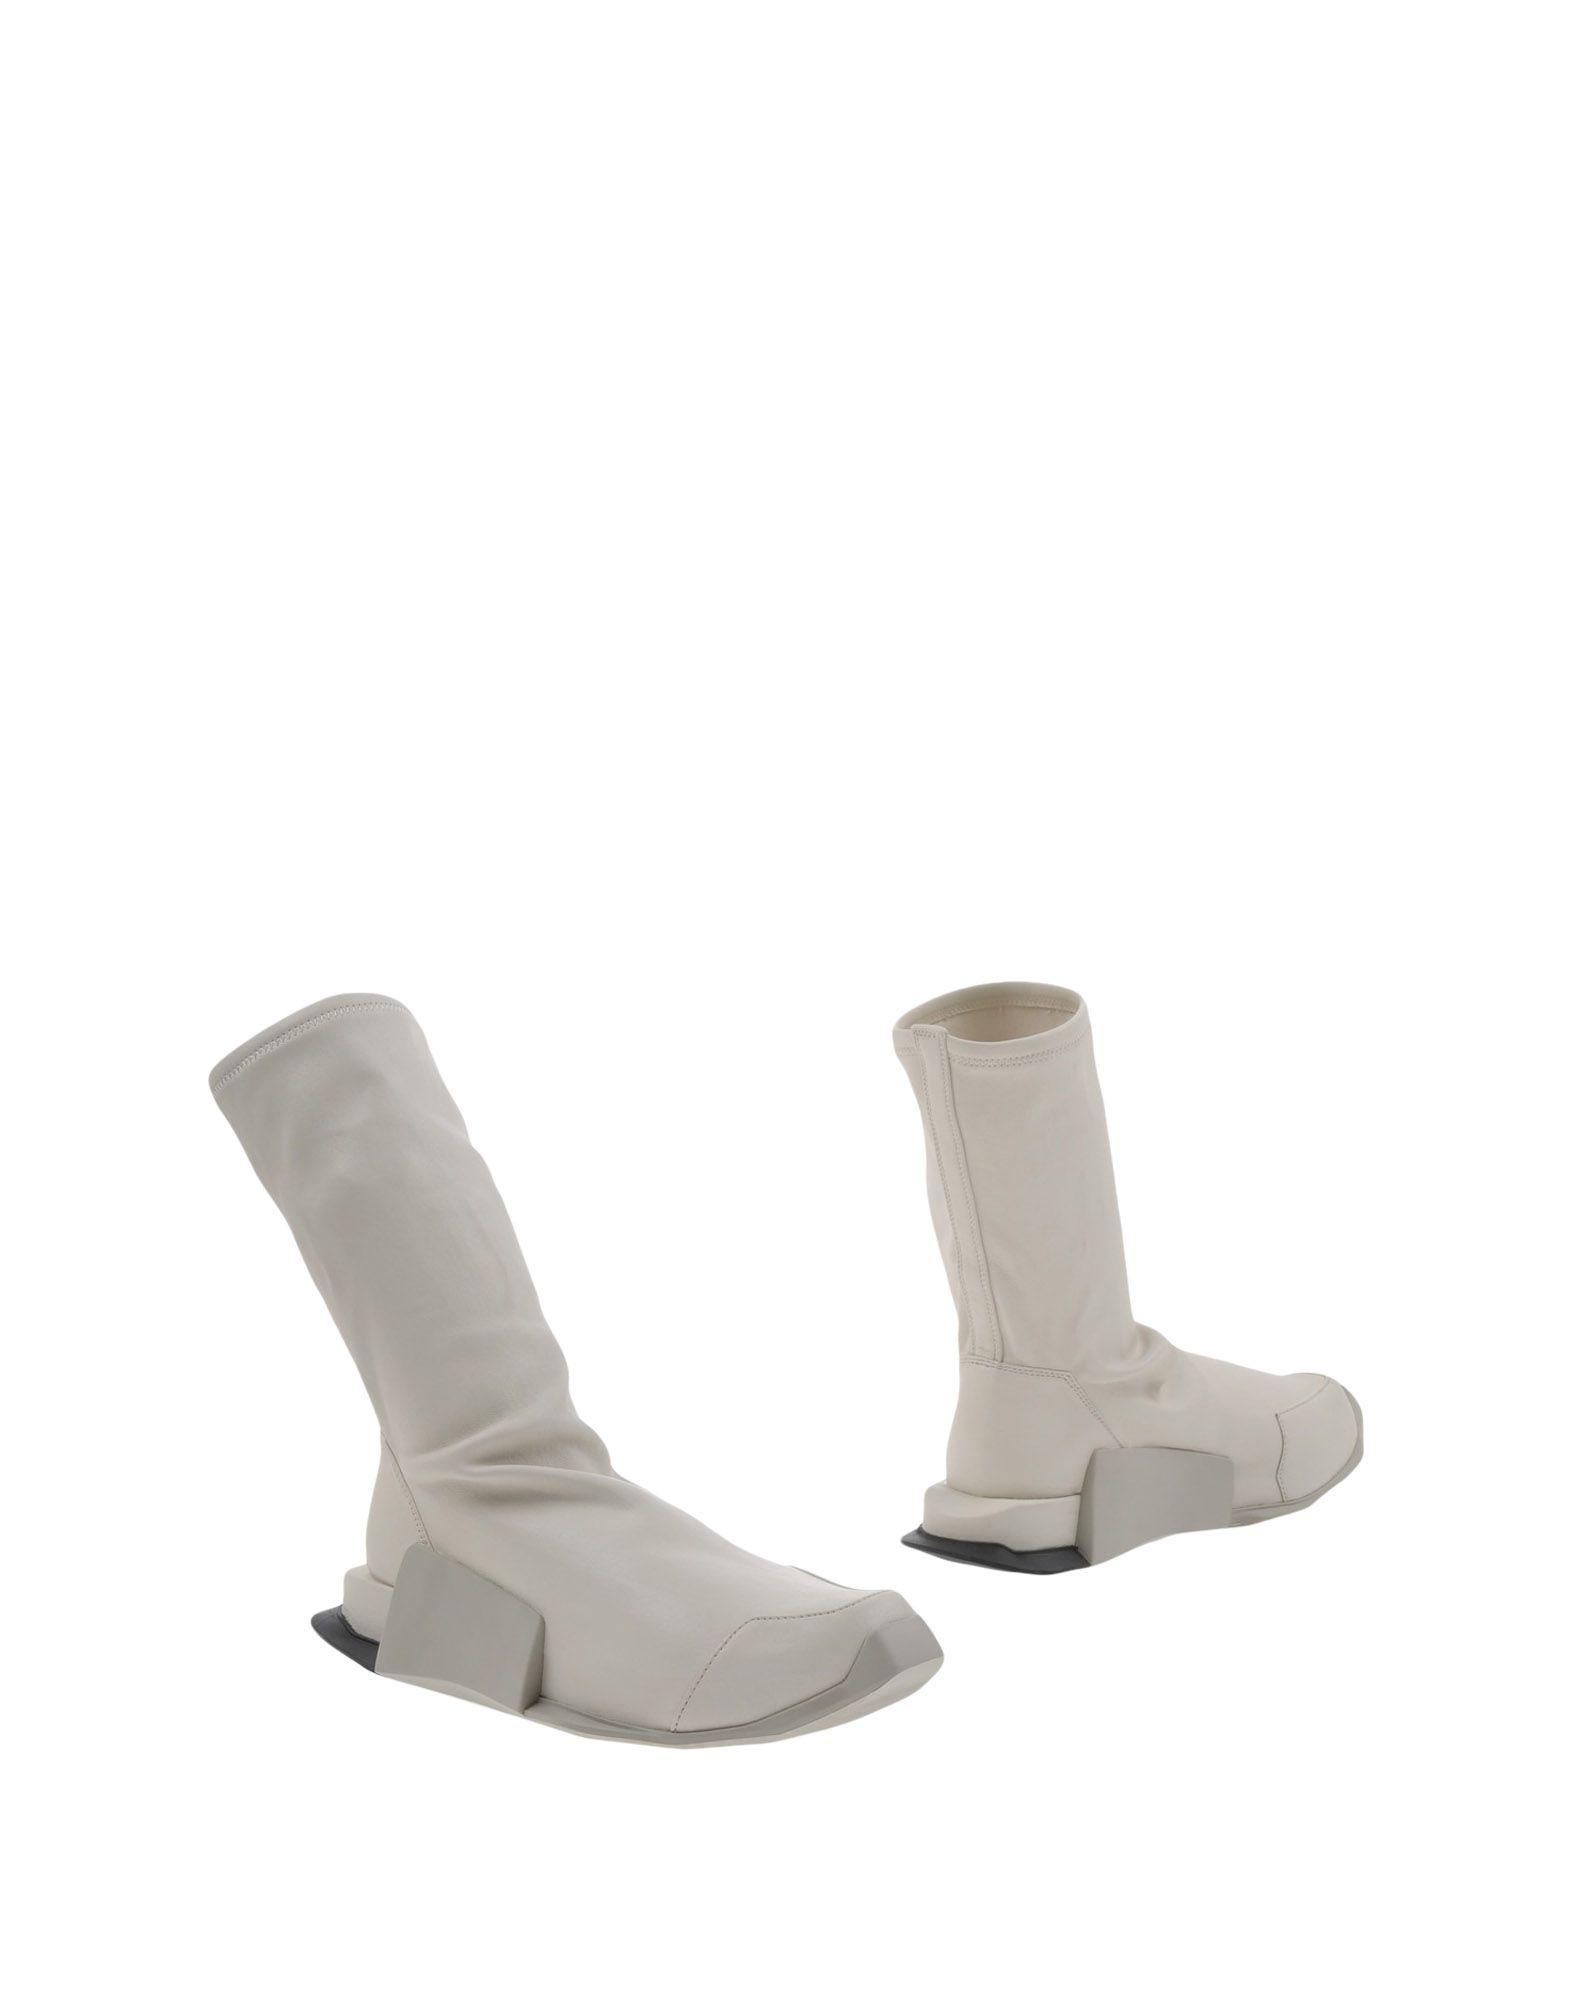 CHAUSSURES - BottinesRick Owens x adidas thaxsp